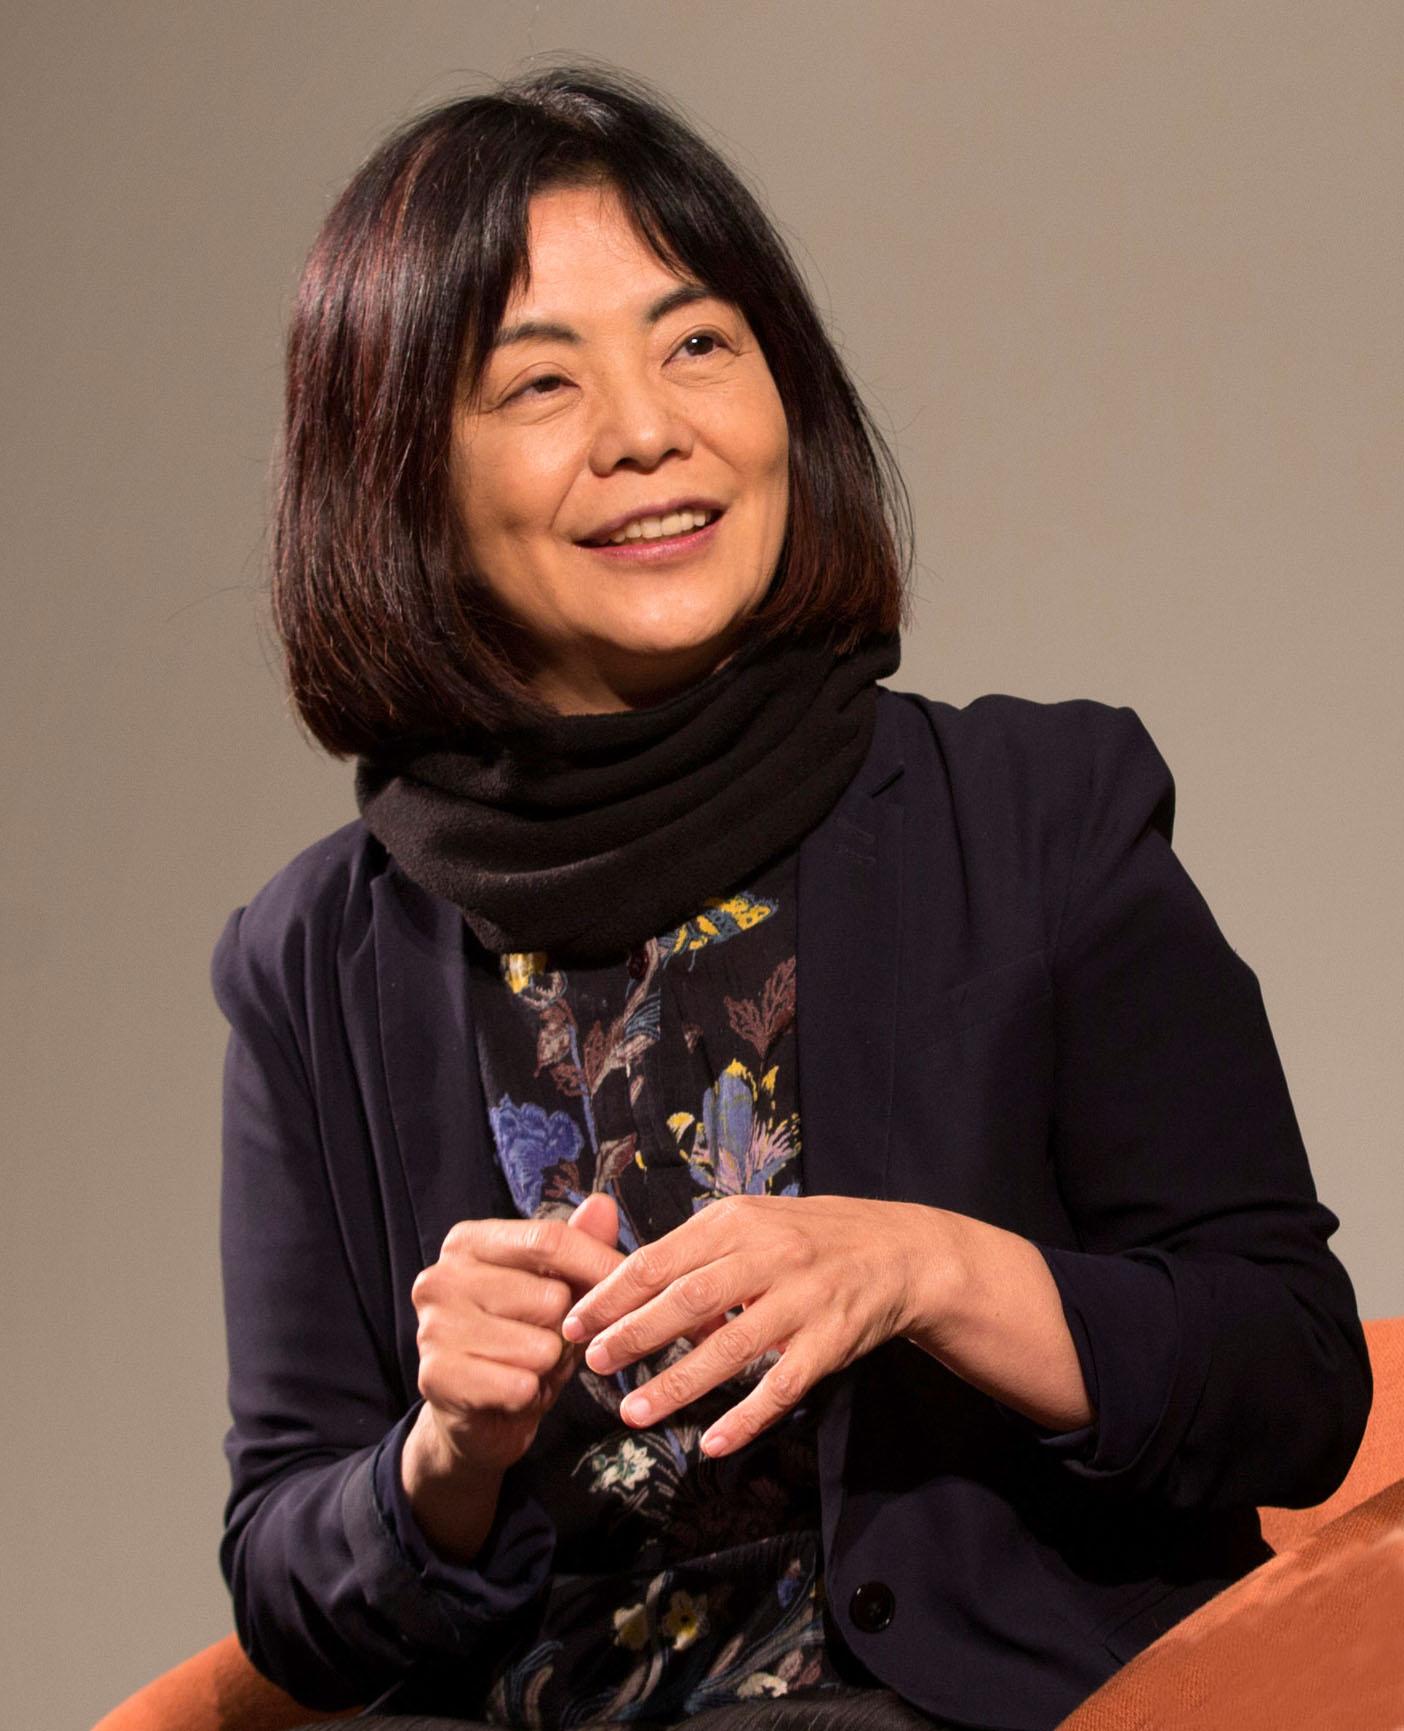 Yoko Tawada im Literarischen Colloquium Berlin